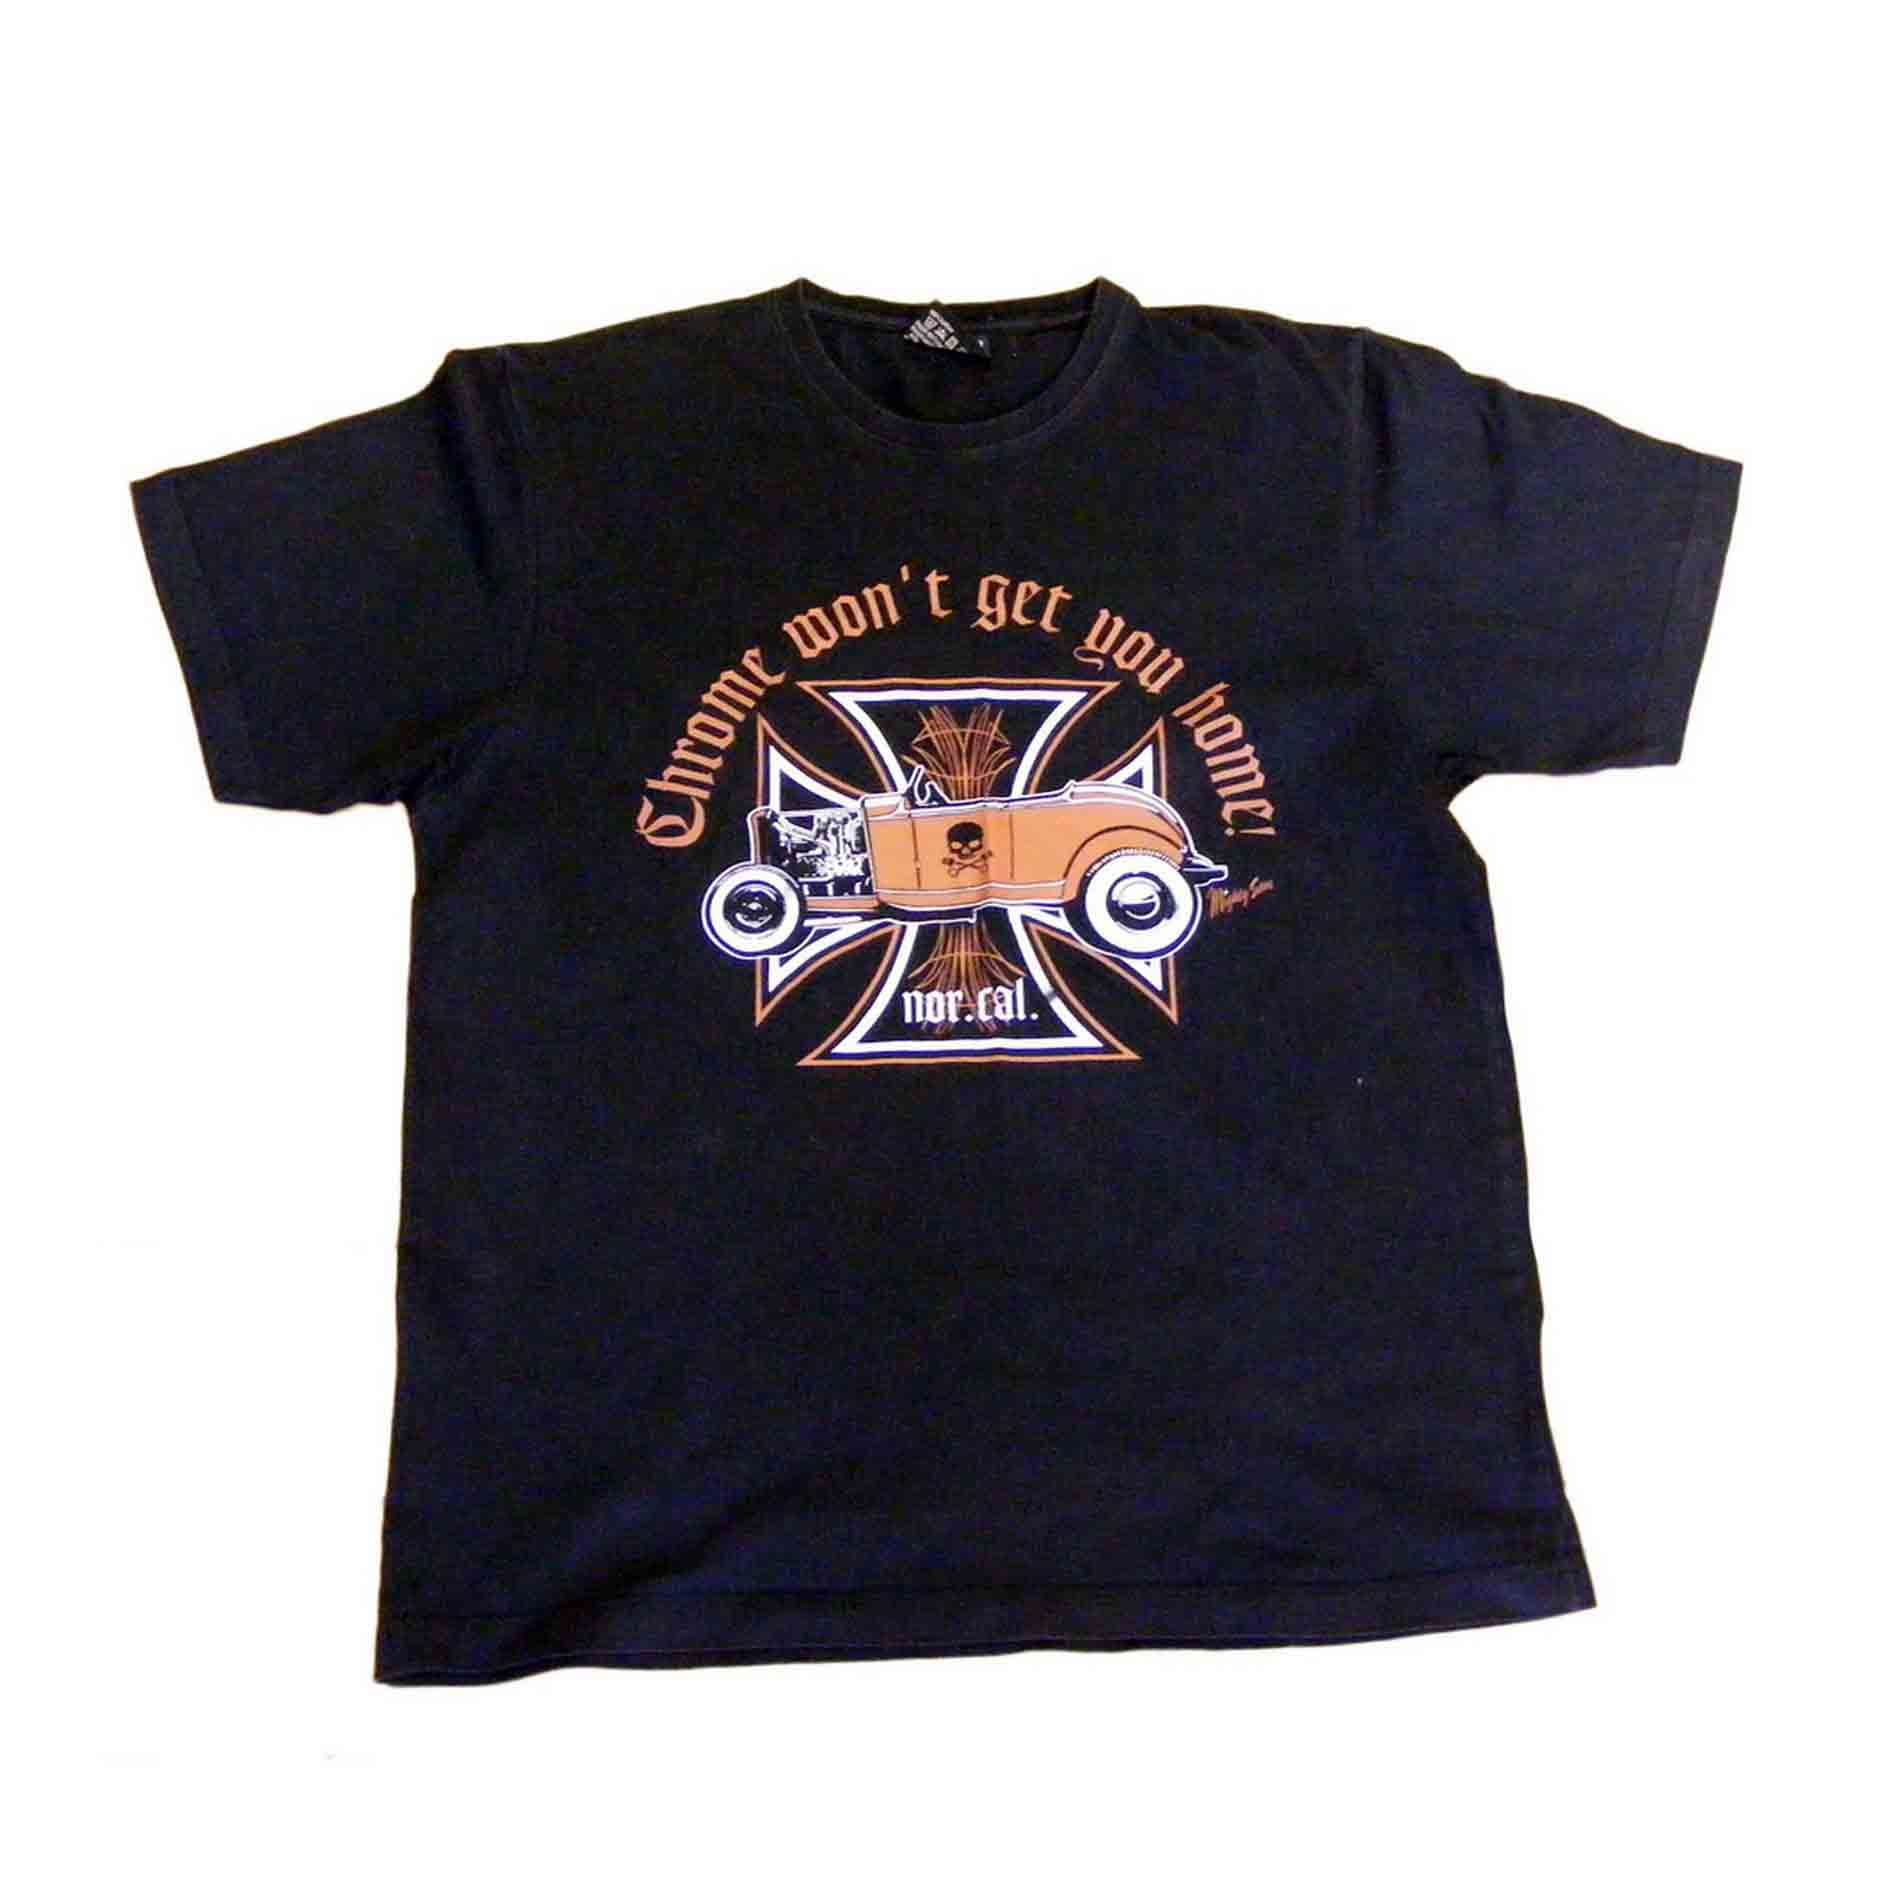 King Kerosin T Shirt M Vintage Clothing Blue 17